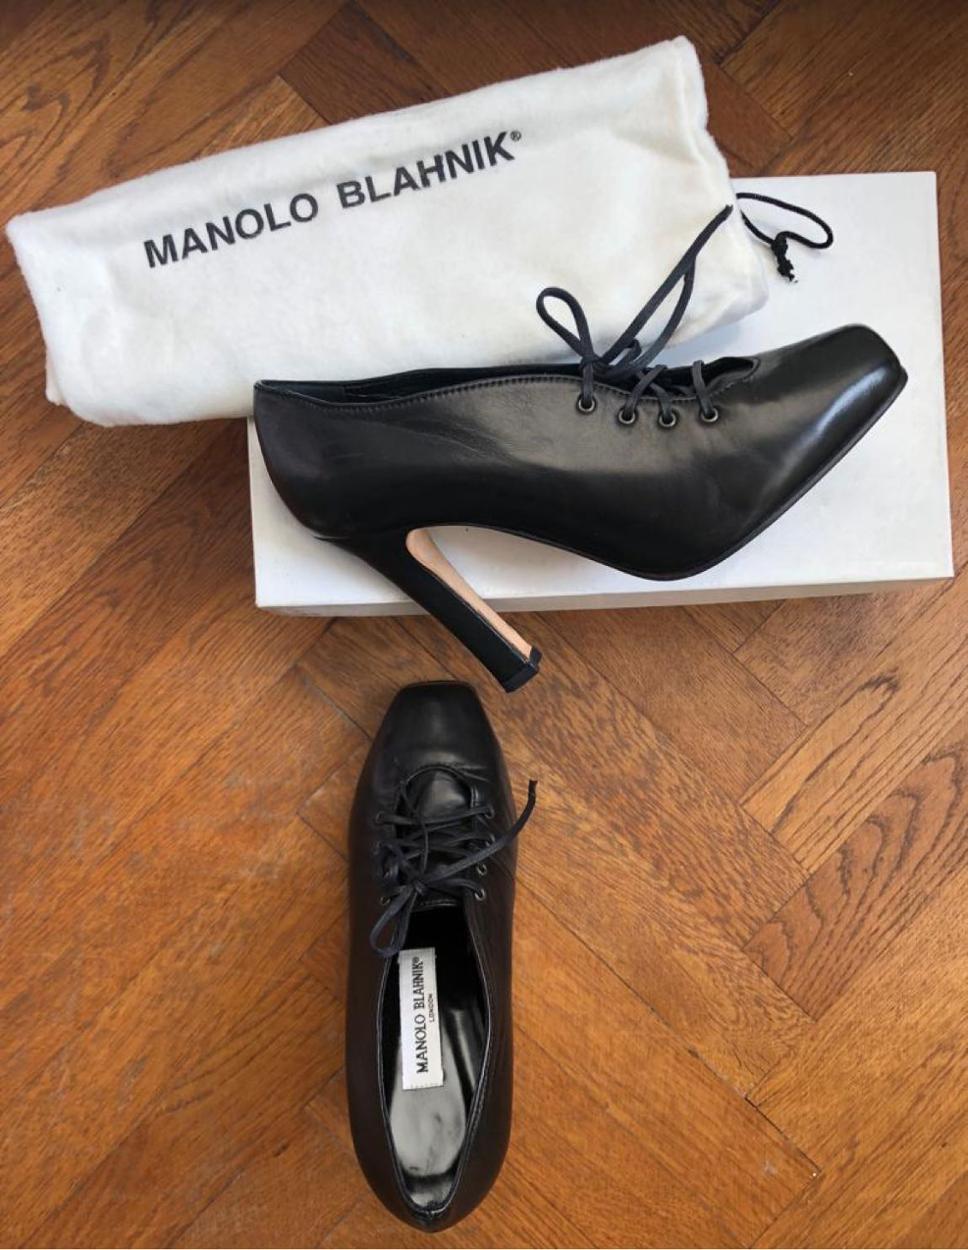 Manolo Blahnik Kalın topuklu